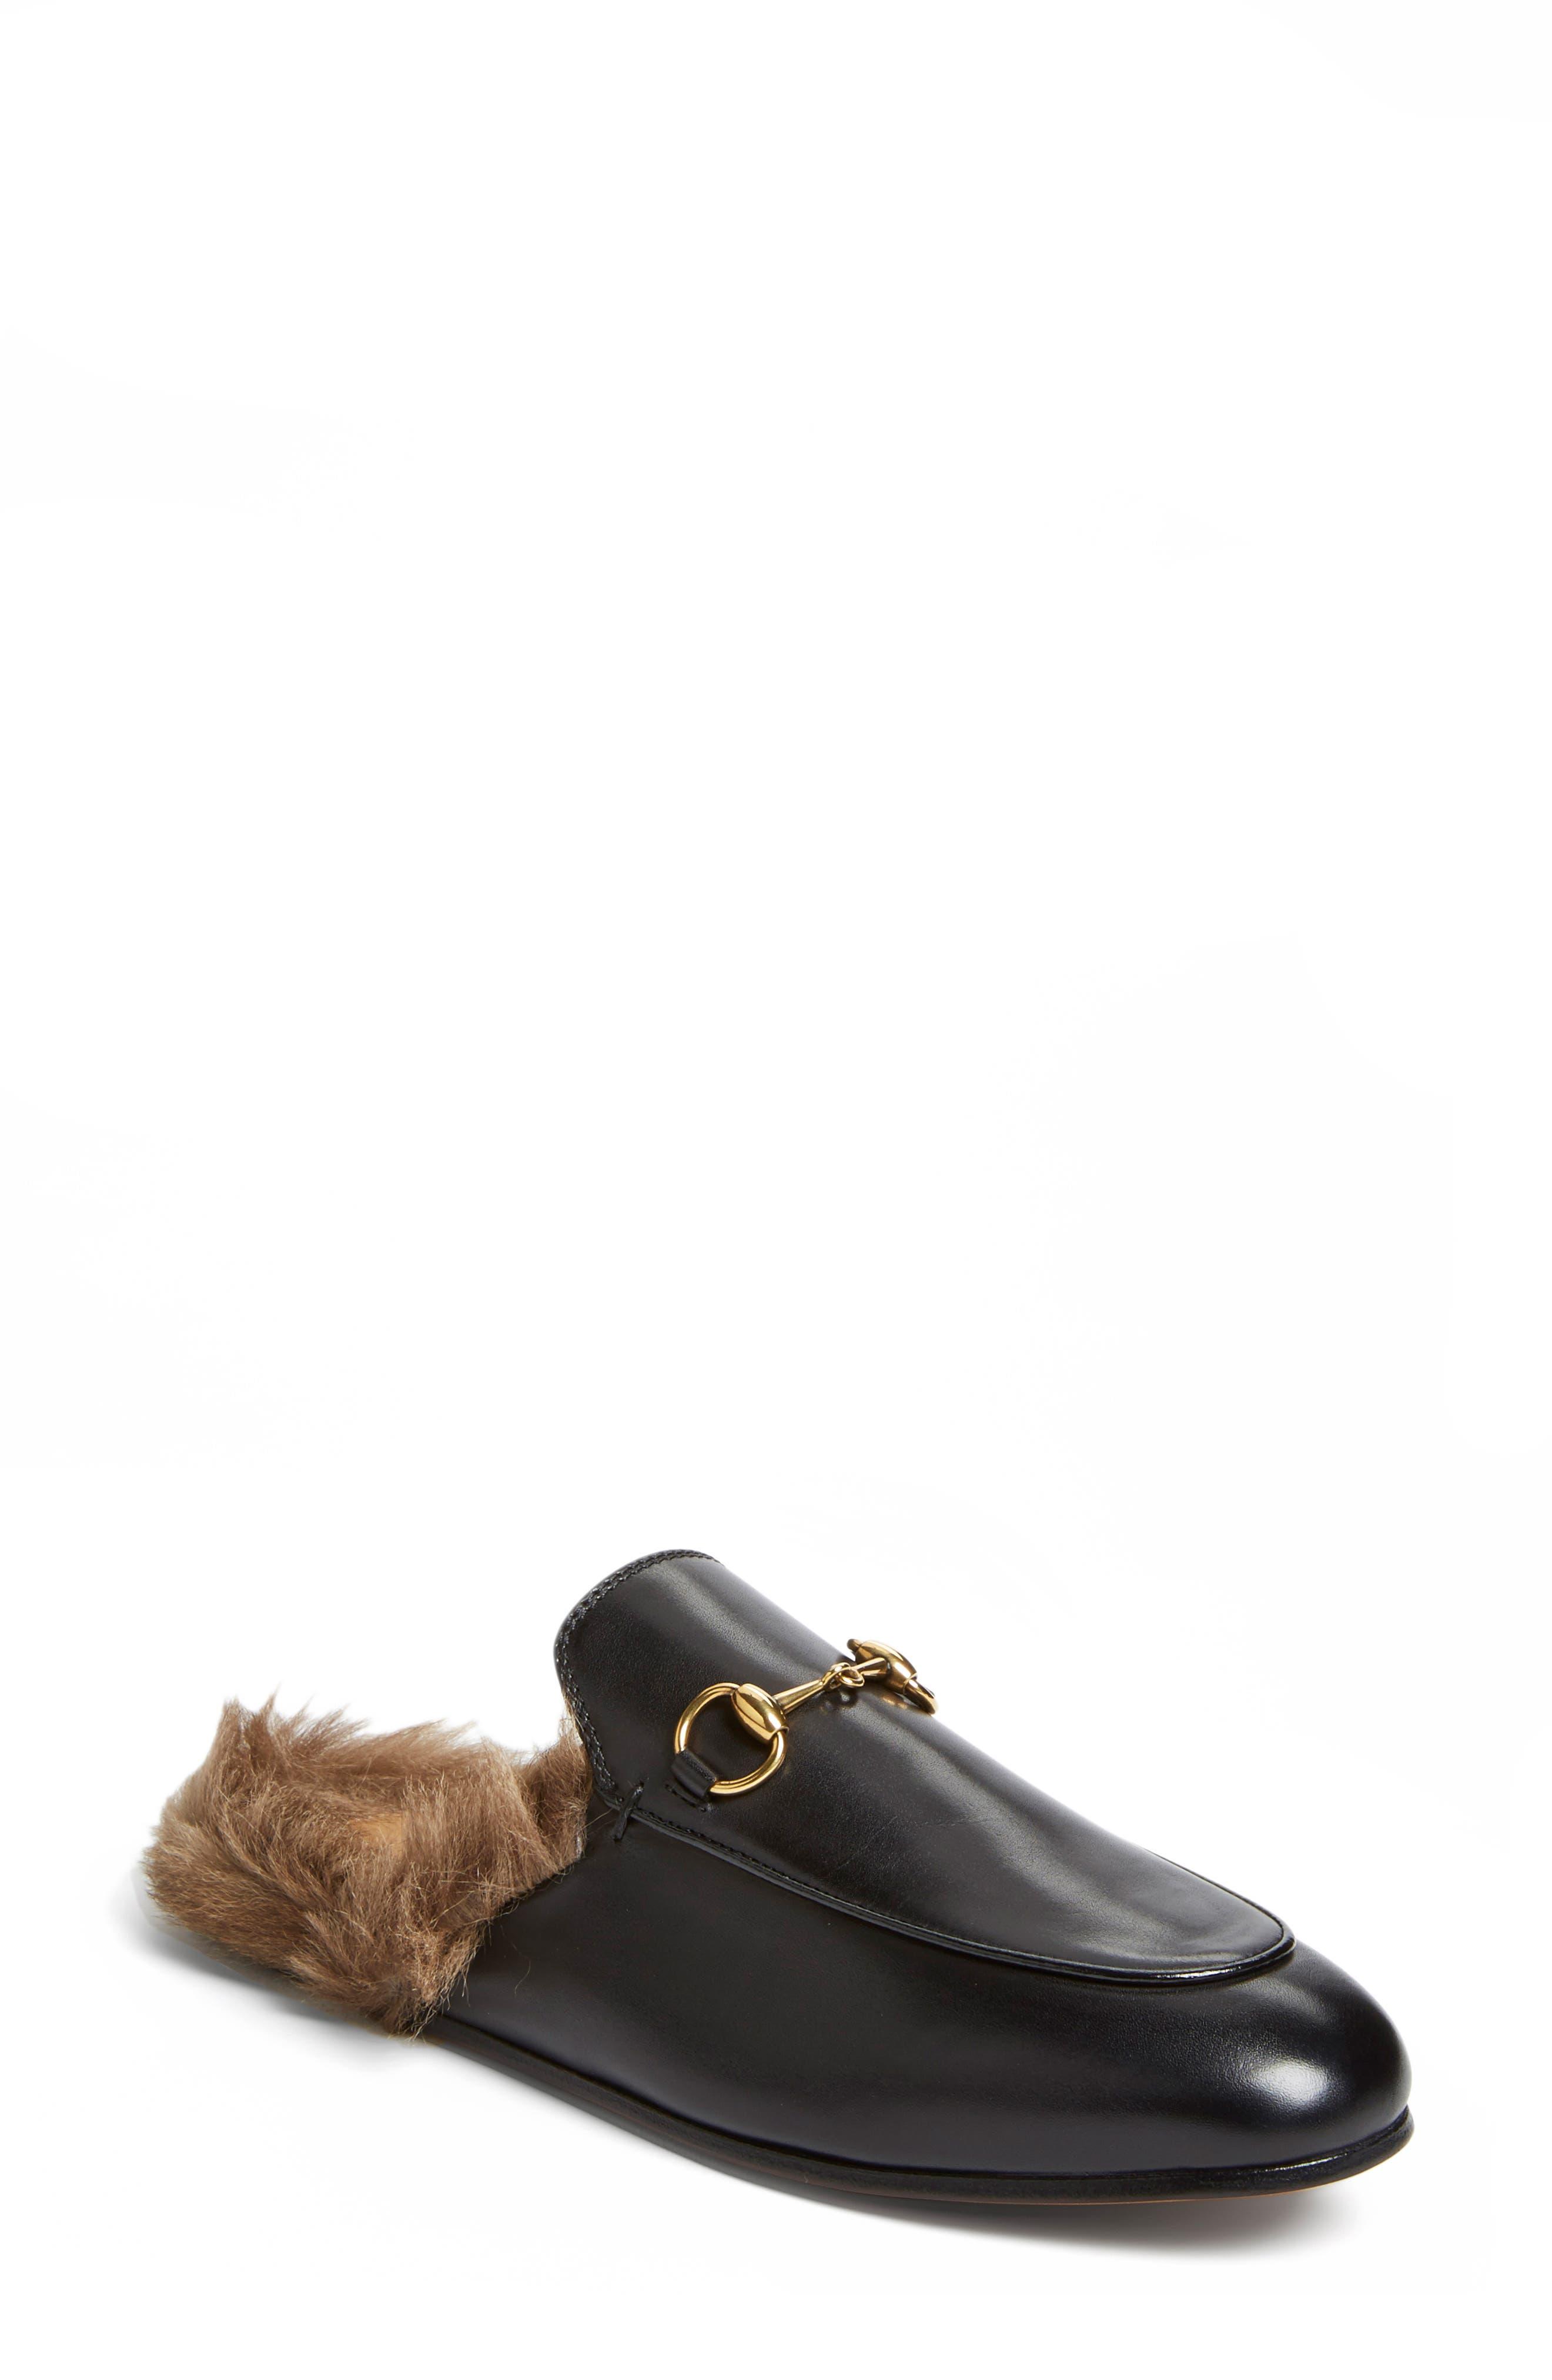 75c3270e5596 Women s Gucci Mules   Slides